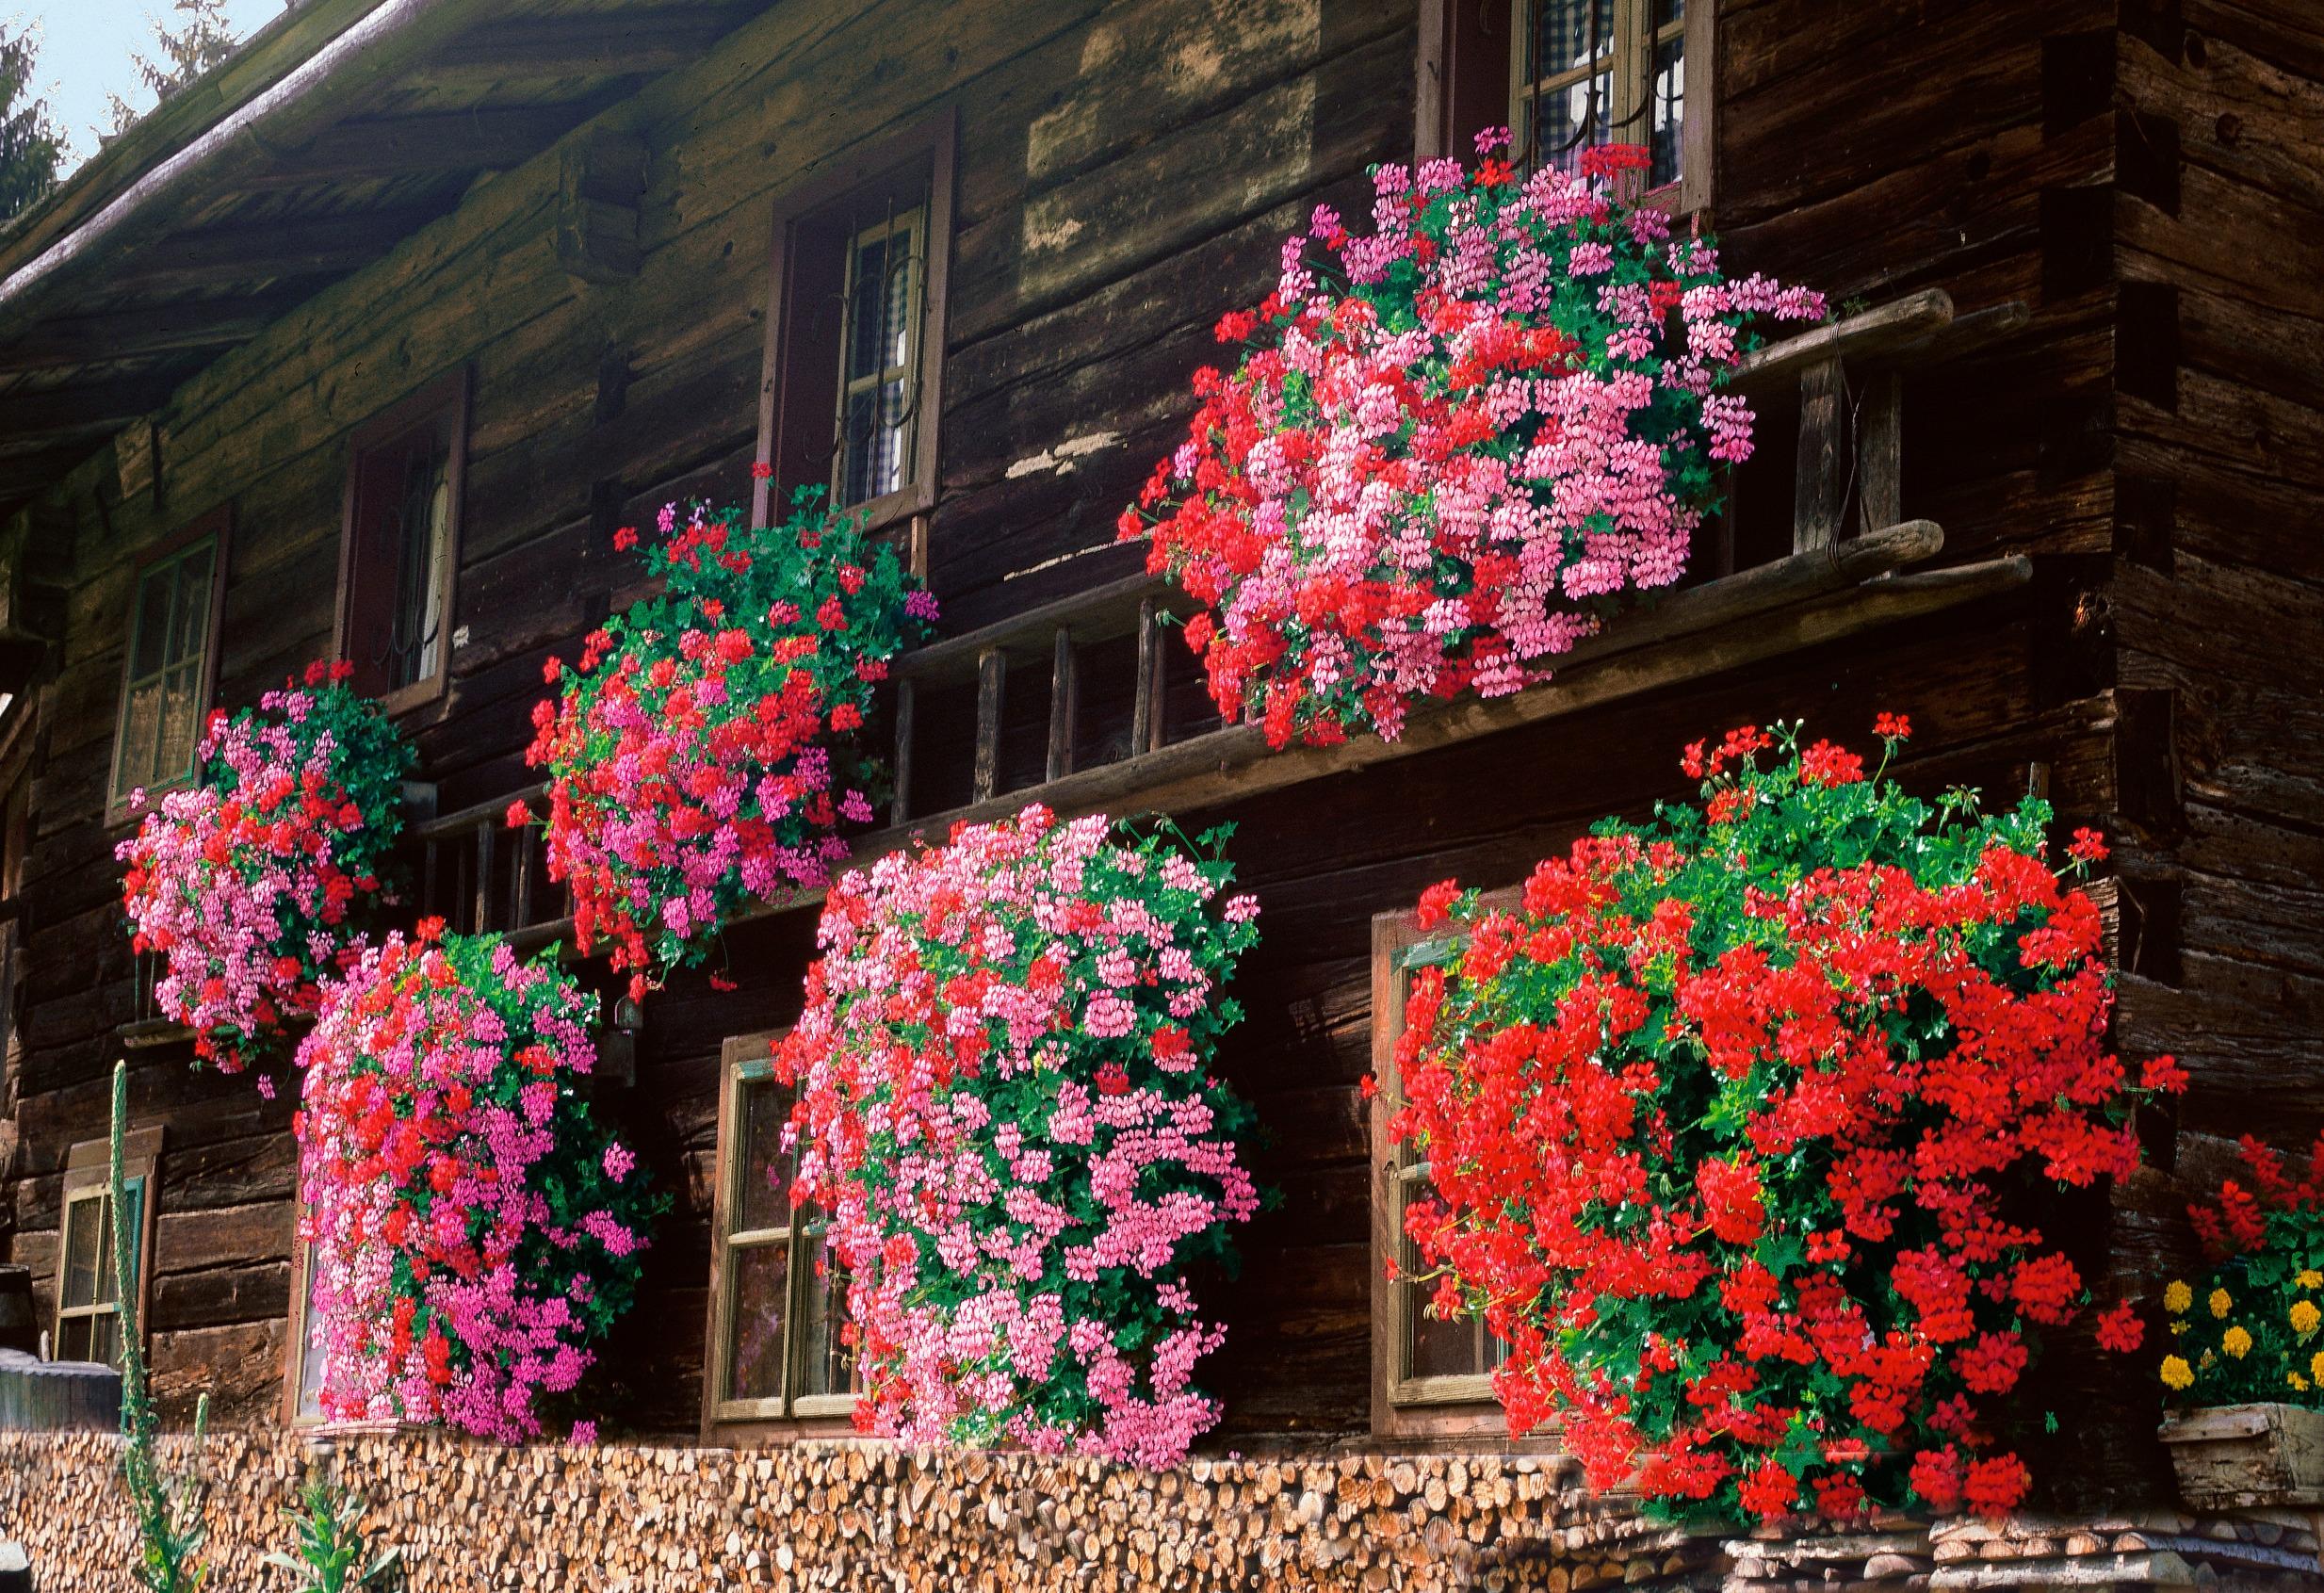 BCM Balkonpflanze Geranie hängend rosa Balkonpflanzen Pflanzen Garten Balkon